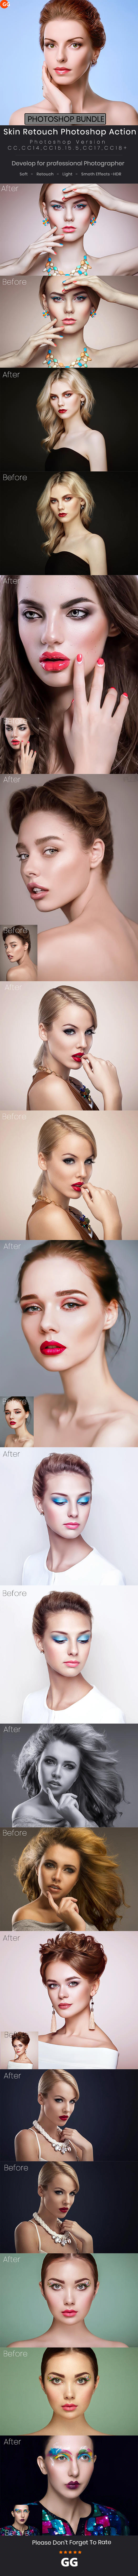 50+ Skin Retouch Photoshop Action Bundle by Kluzya on DeviantArt